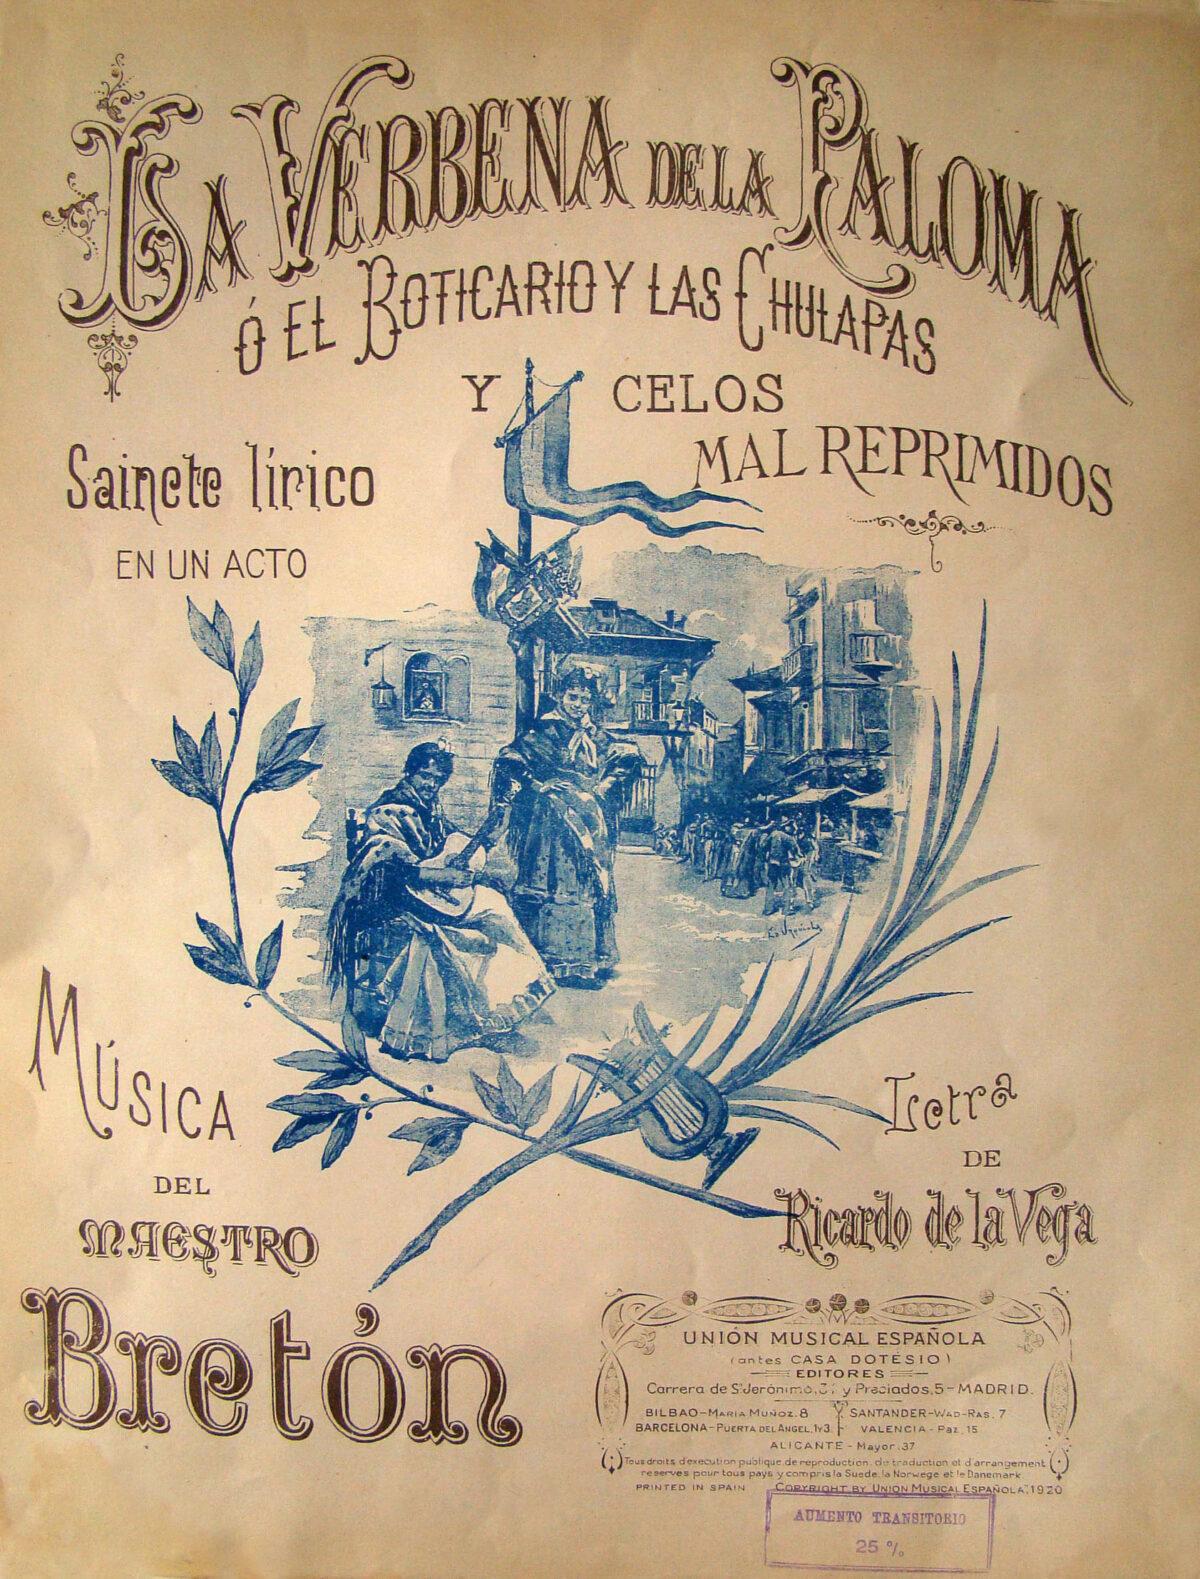 La Verbena de la Paloma cartel 1894